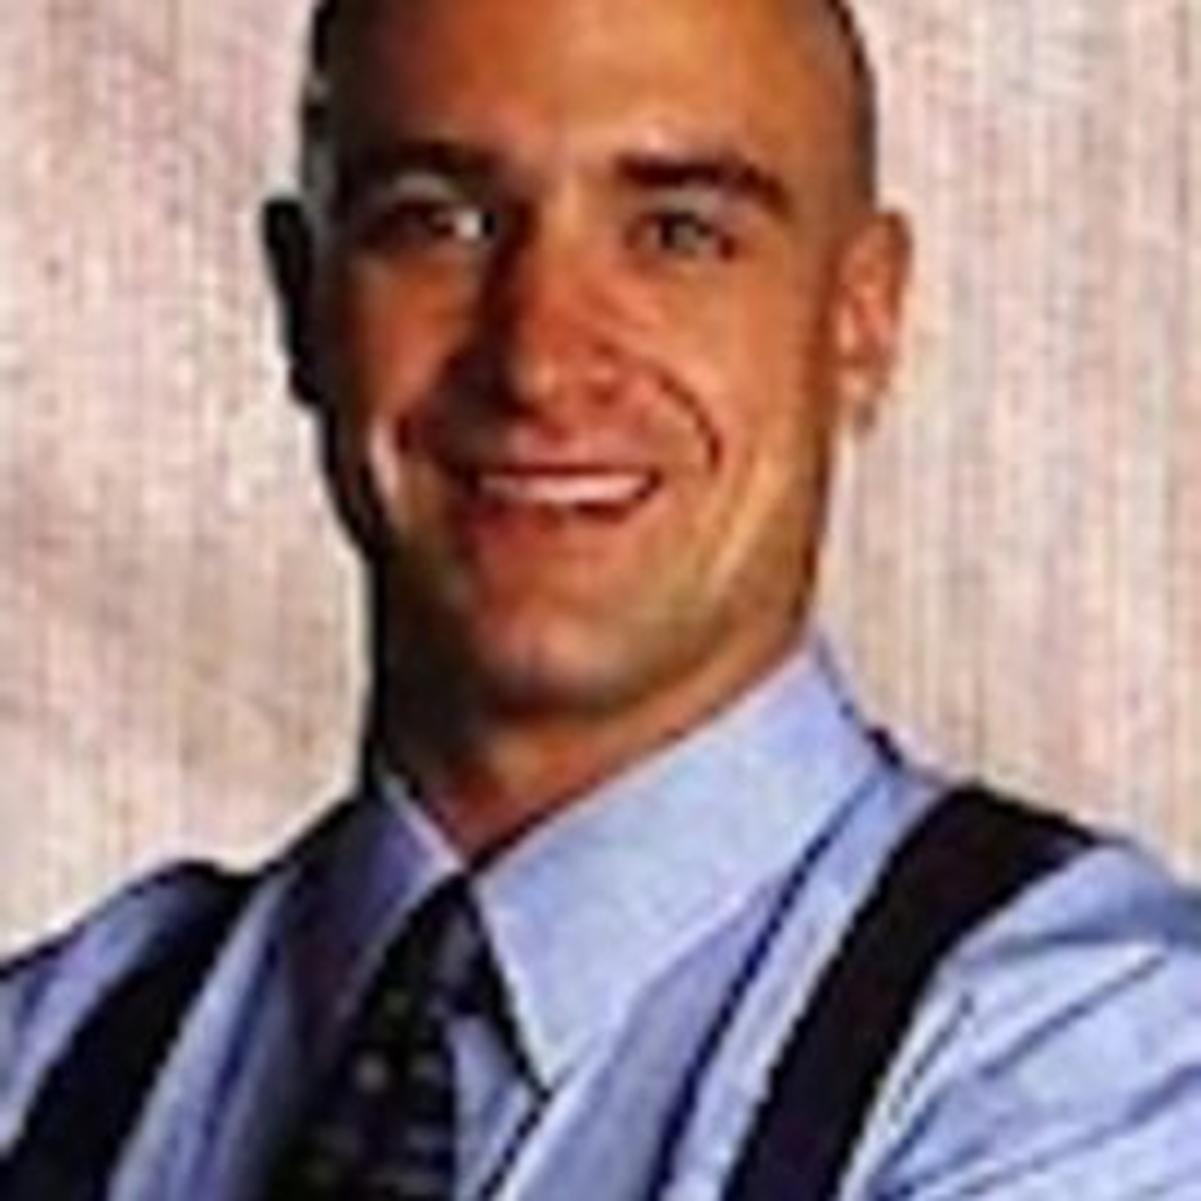 Steve Moroski